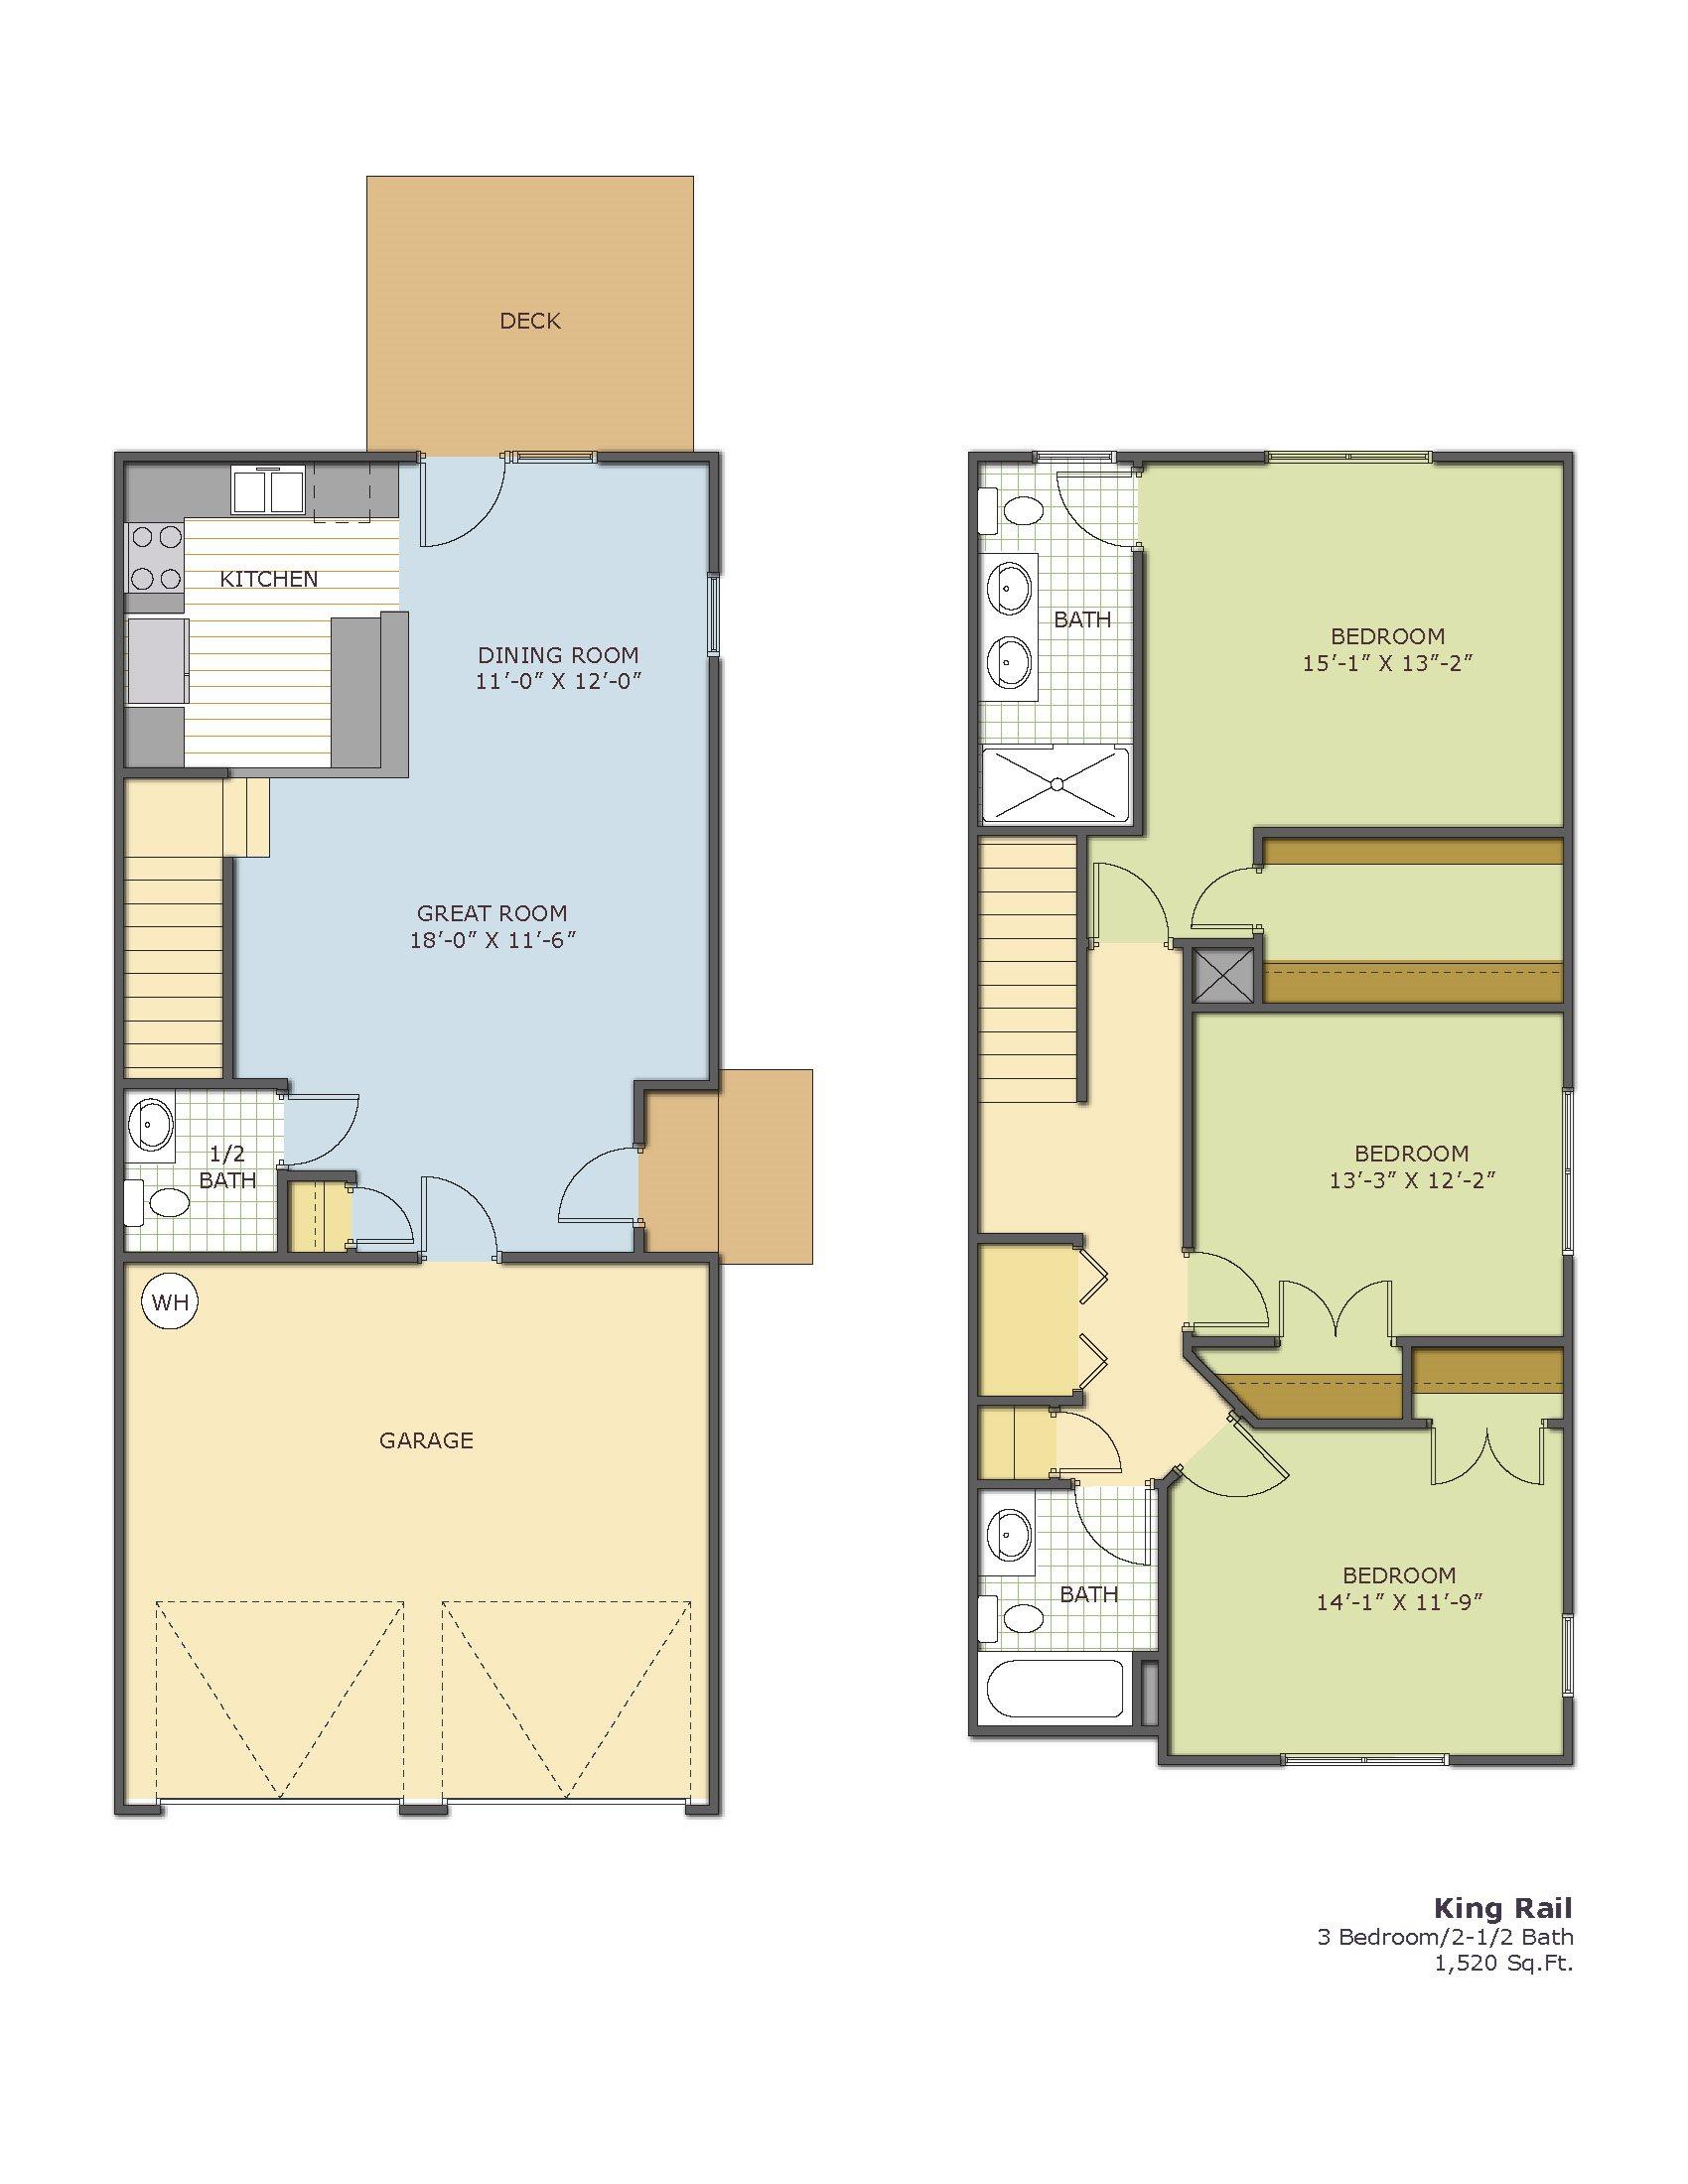 King Rail -Townhouse Floor Plan 8